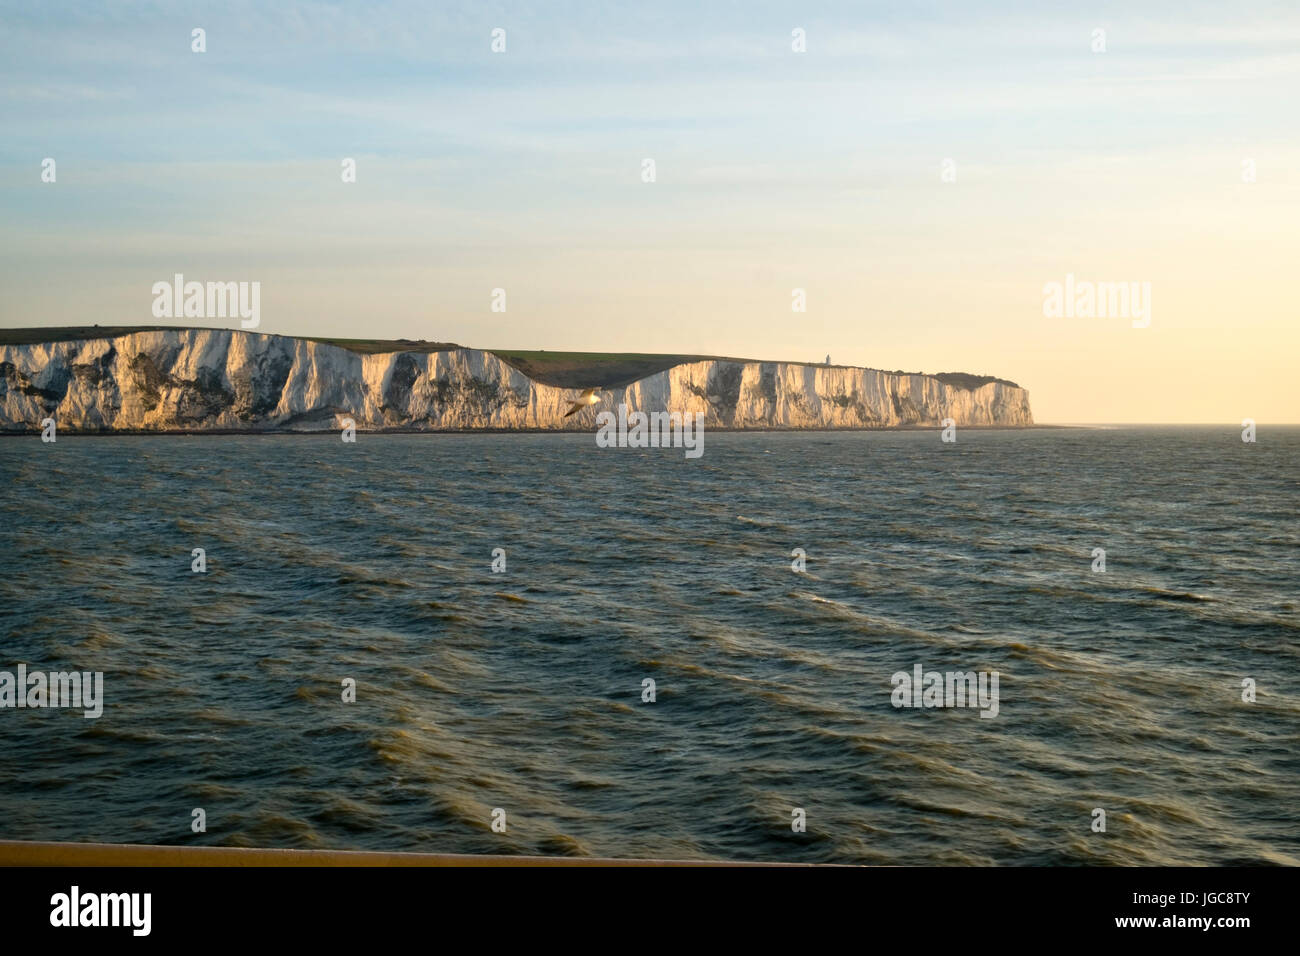 Una mañana temprana Cross channel ferry pasa los acantilados blancos de Dover, Kent, UK rumbo a Calais, Francia. Imagen De Stock